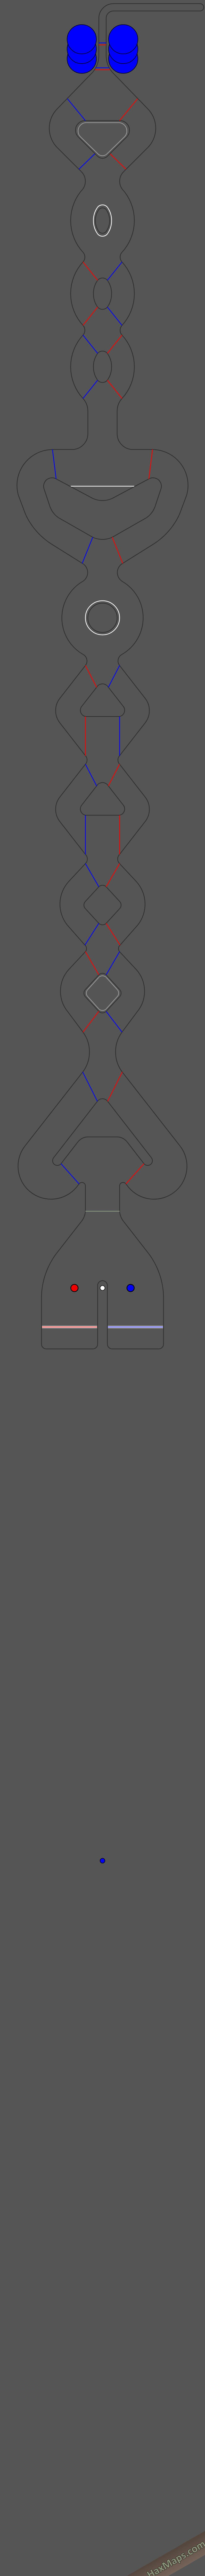 hax ball maps | Collision team racing 11 by MC